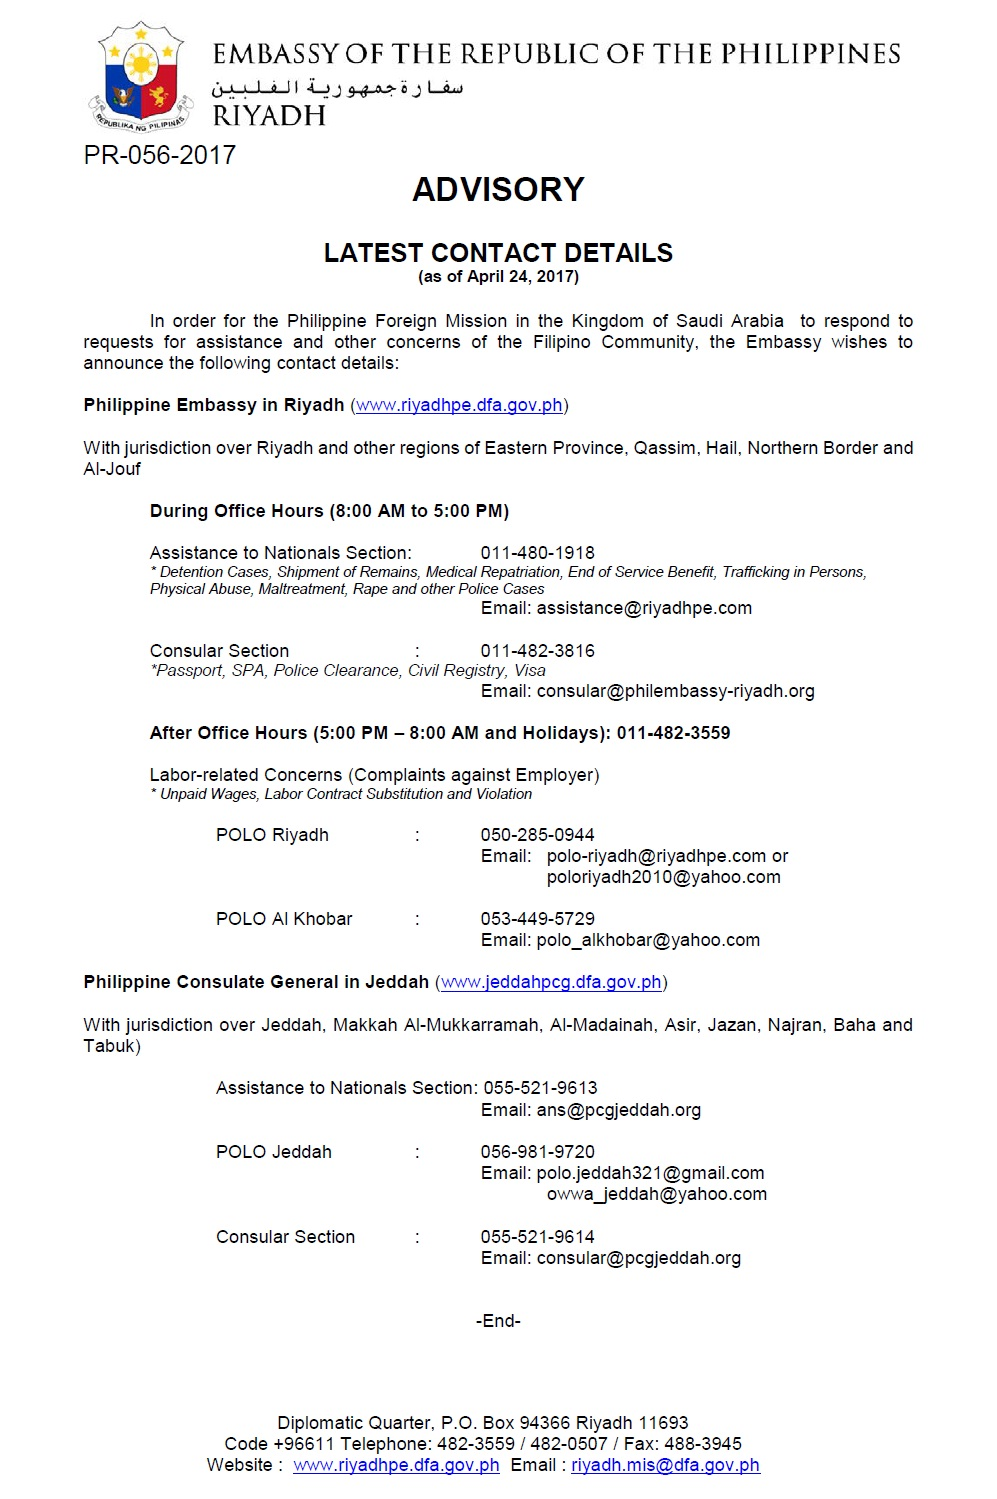 PhilEmb-Riyadh Latest Contact Details | Overseas Filipinos Worldwide